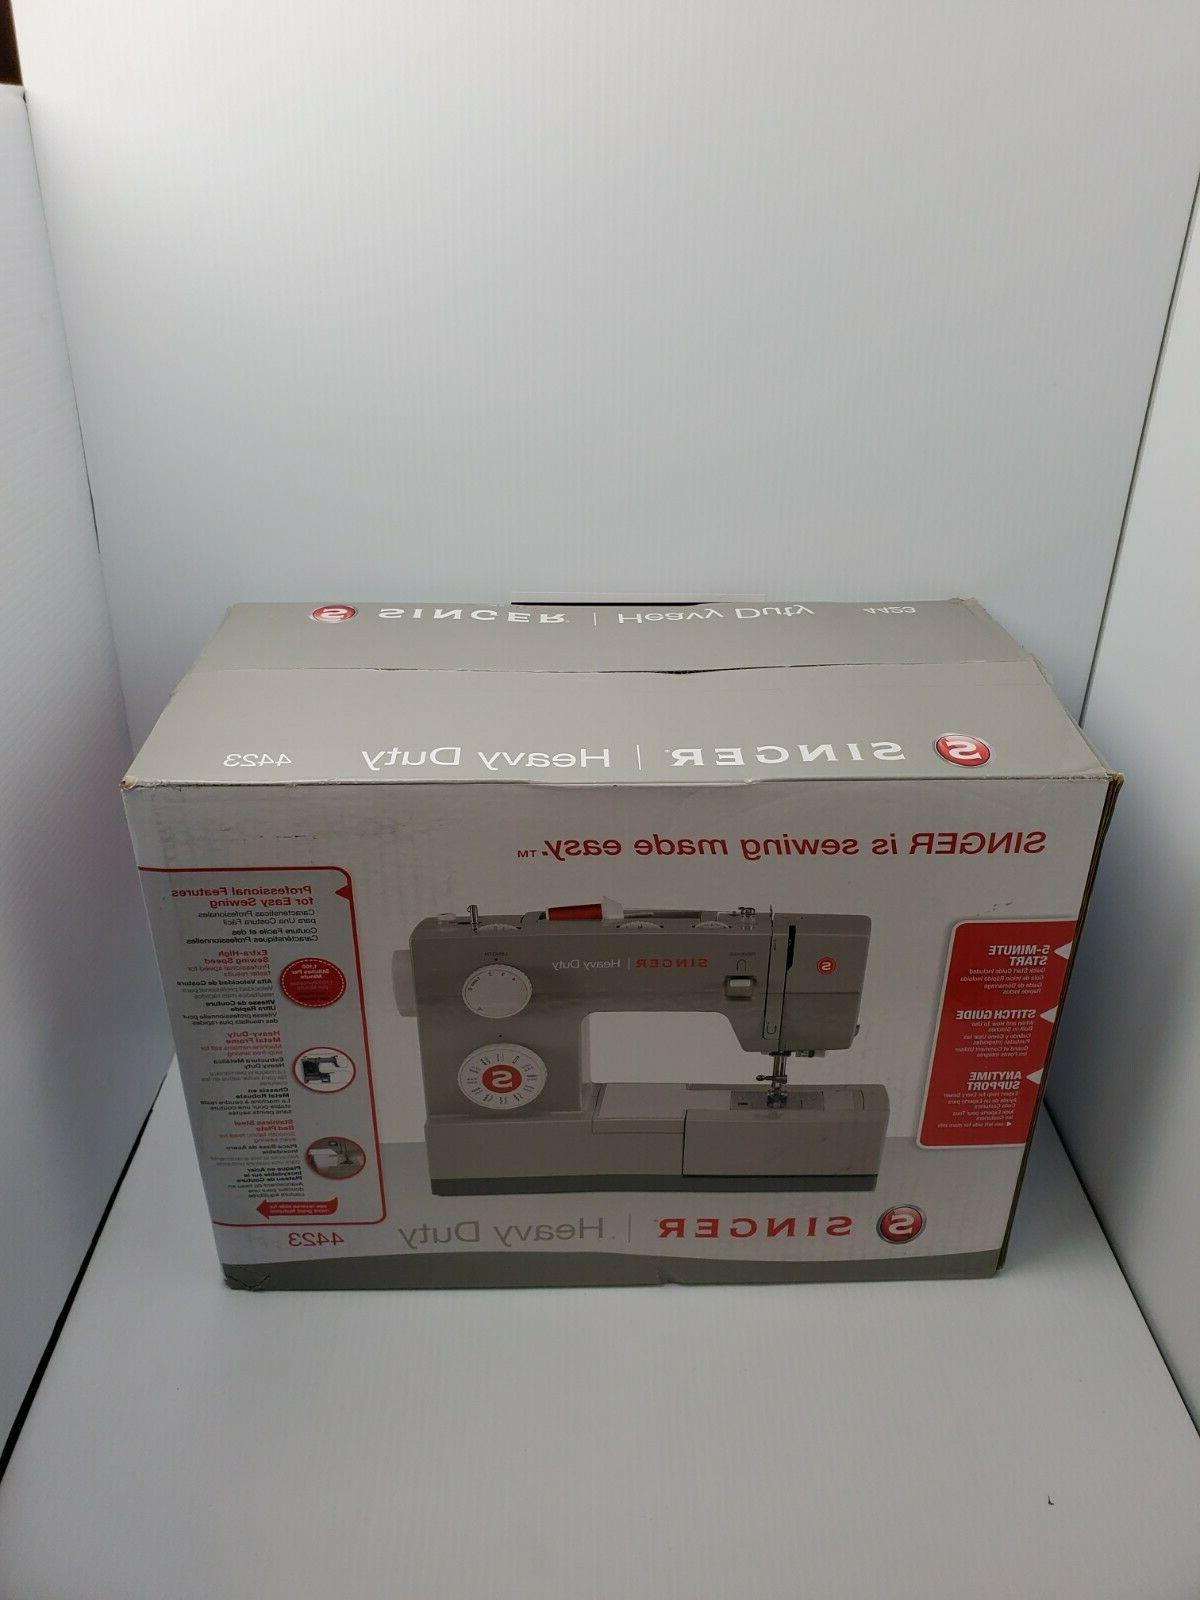 heavy duty 4423 sewing machine free priority